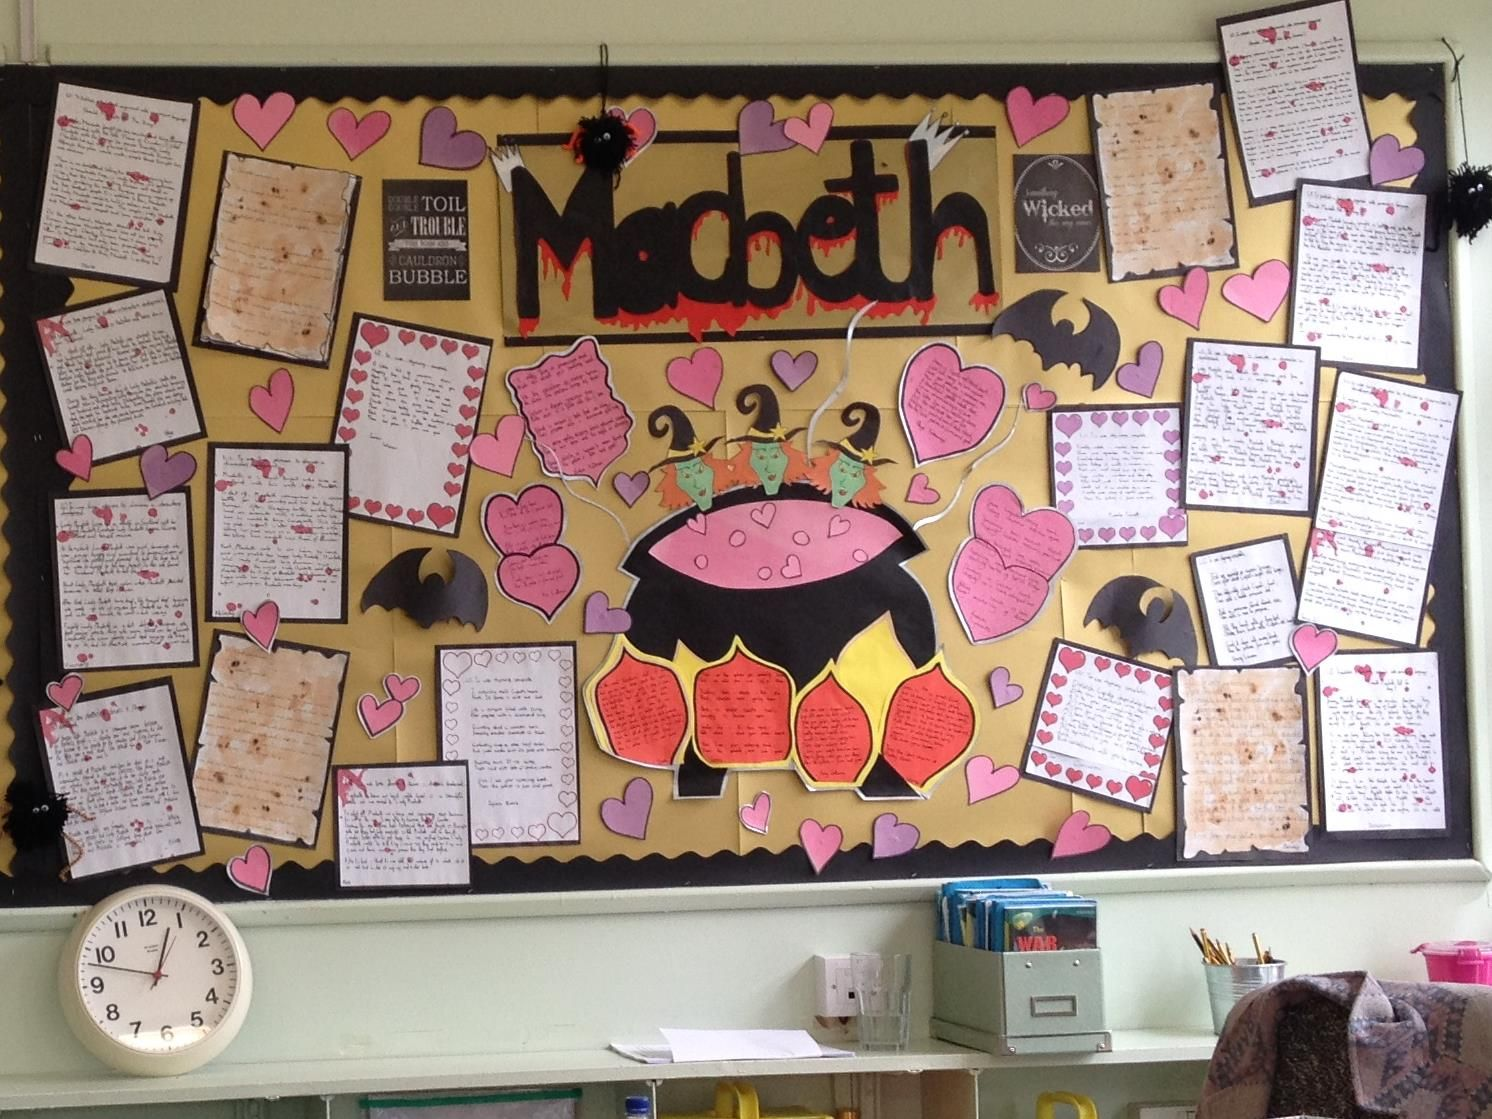 Classroom Ideas Display ~ Macbeth classroom display ideas inspiration and